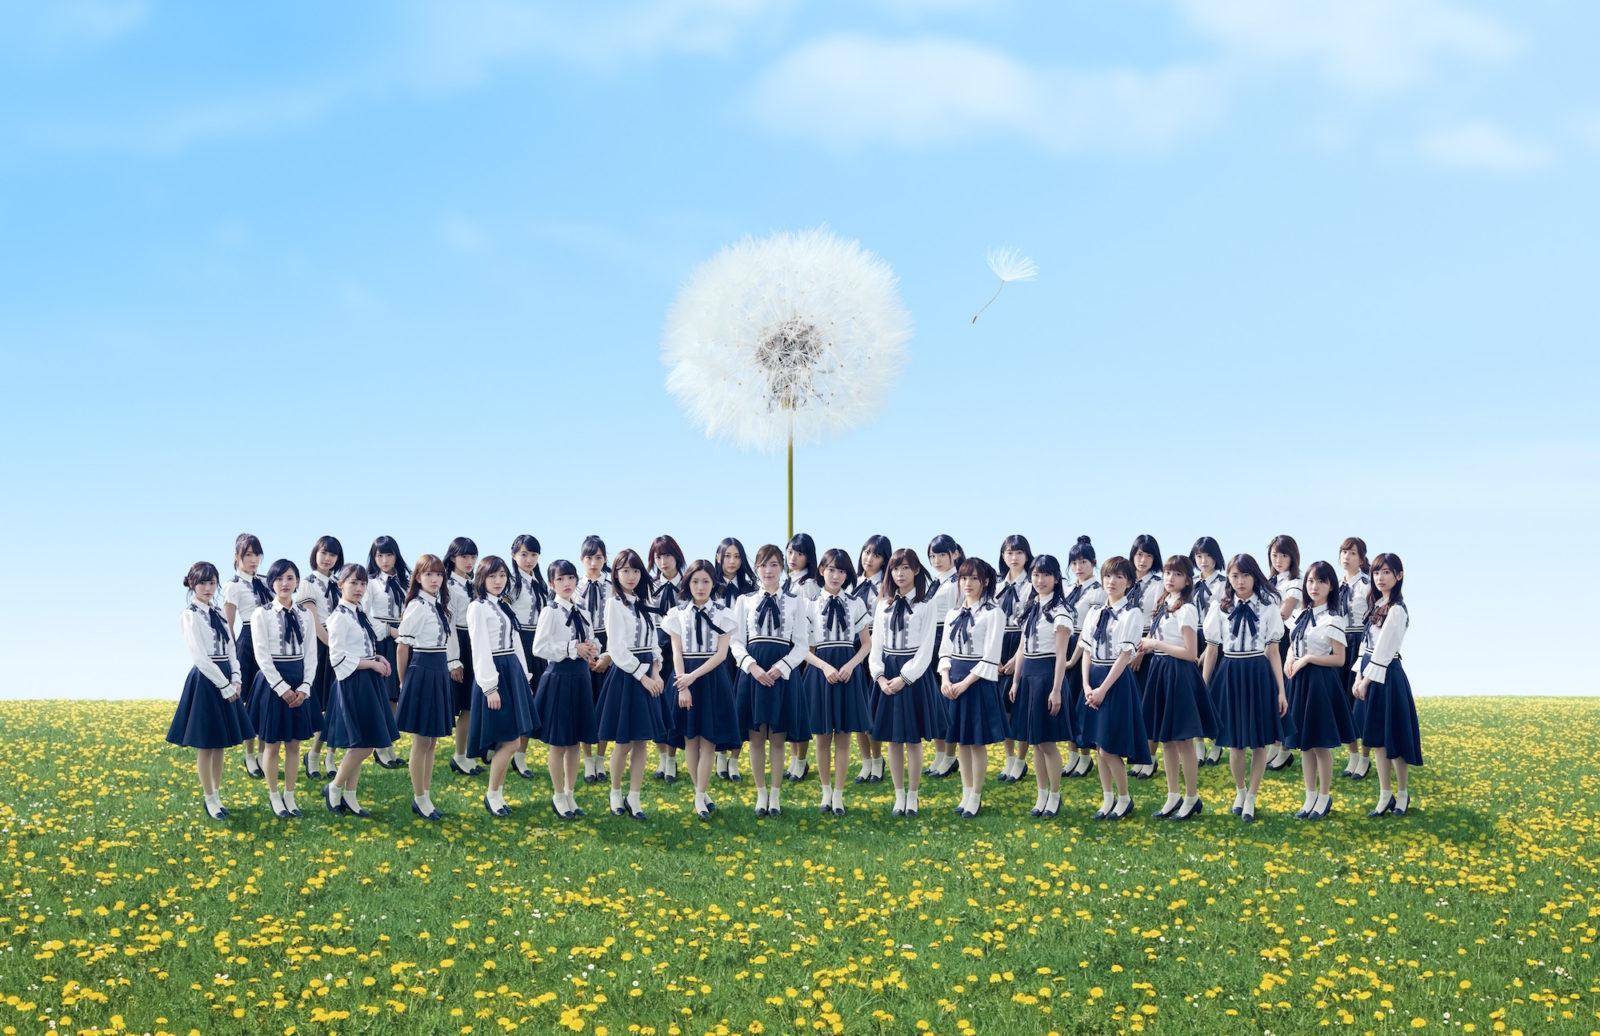 AKB48総選挙中止でメンバー謝罪、渡辺麻友「言葉が出てこない」指原莉乃「本当にごめんなさい」サムネイル画像